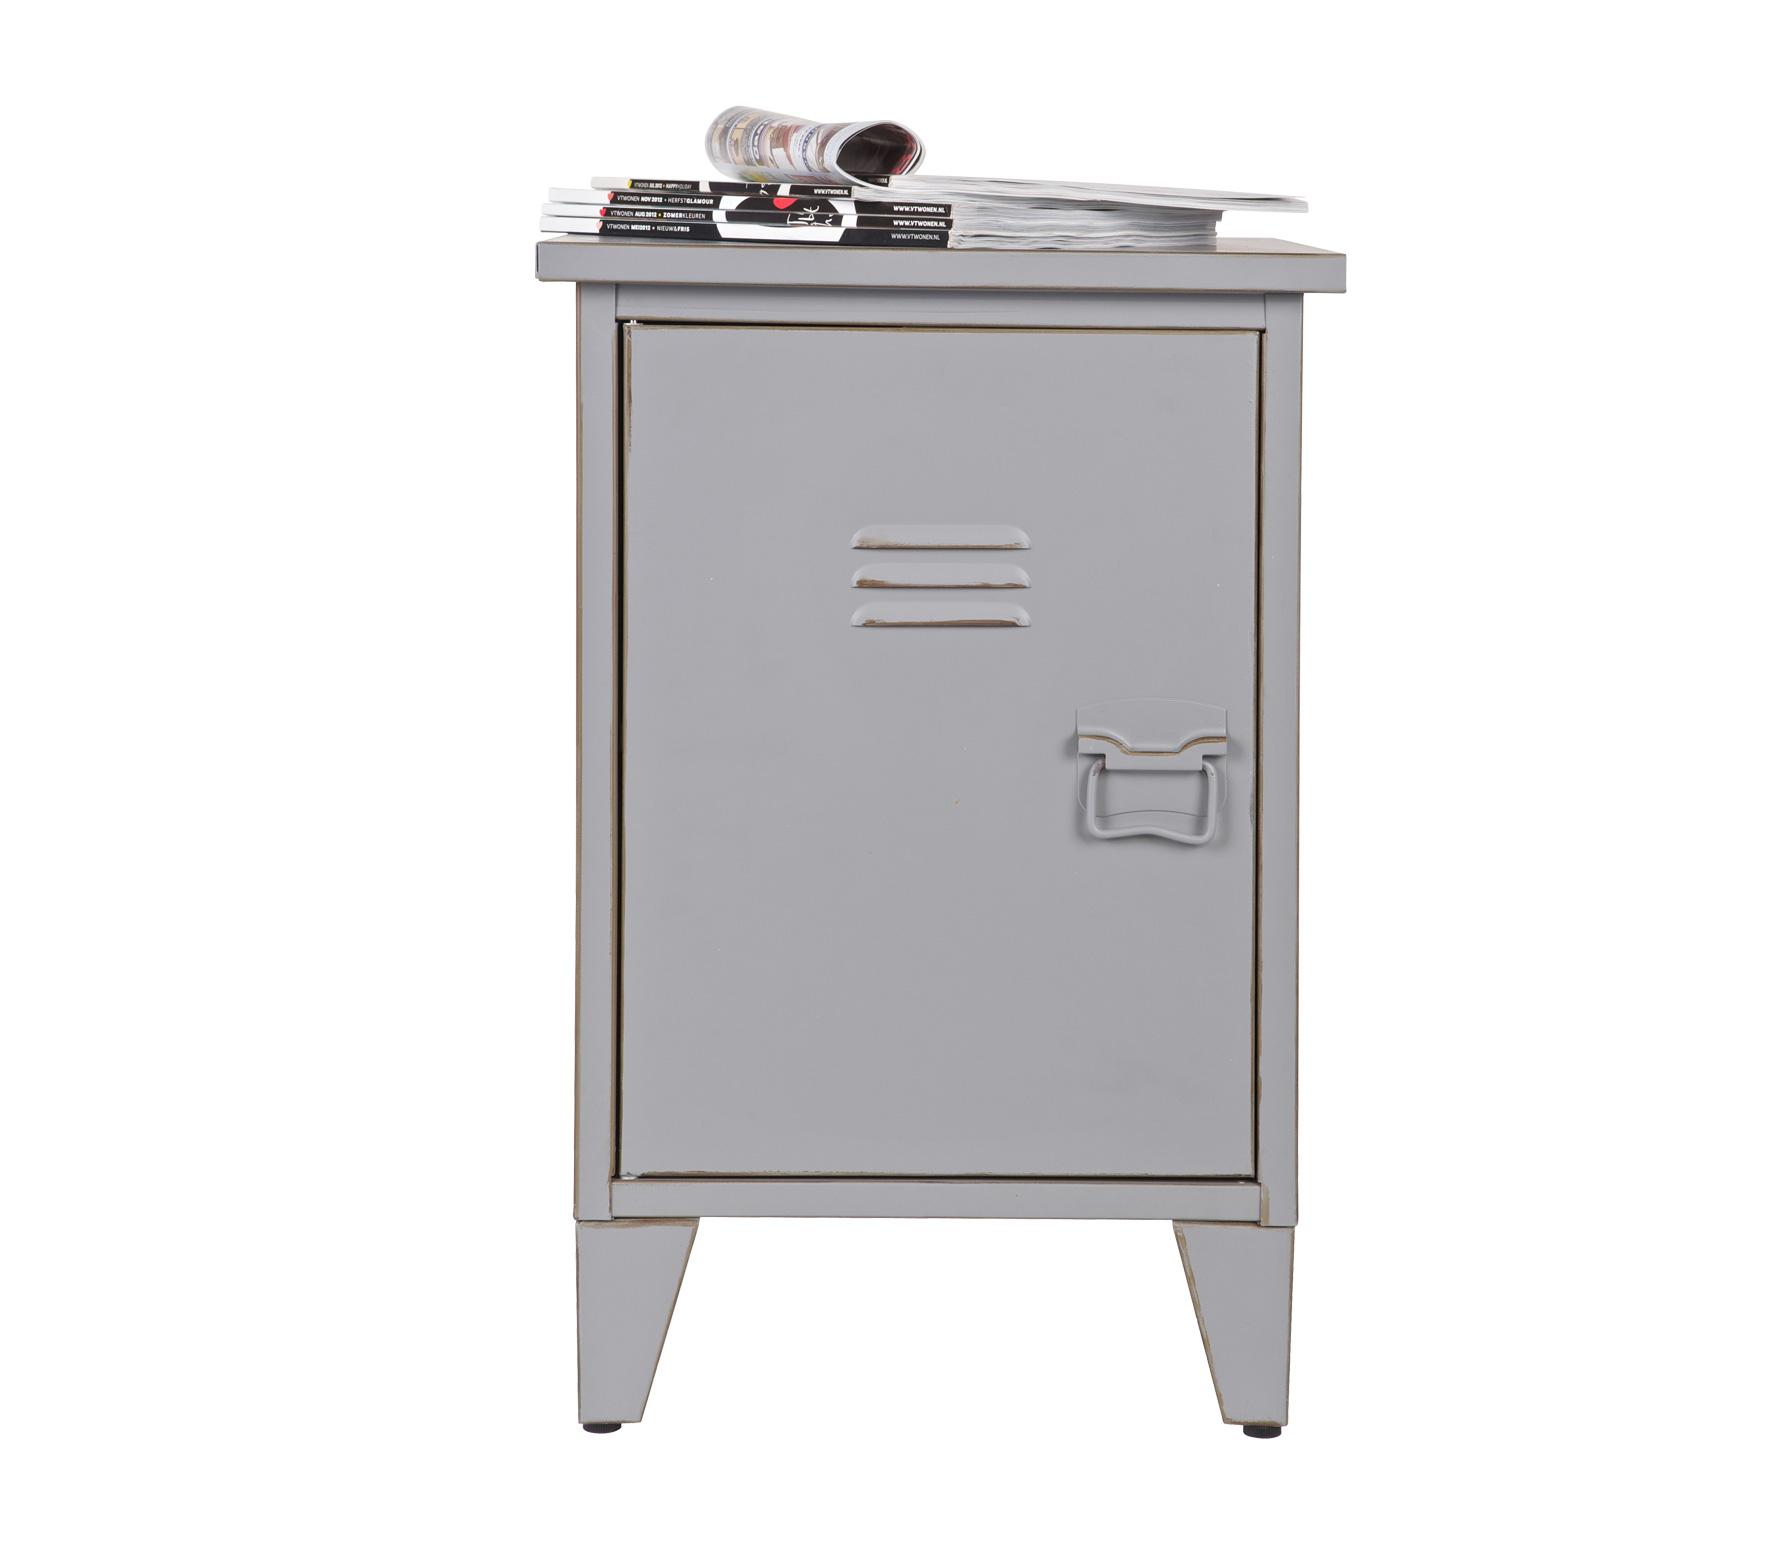 Woood max lockernachtkastje metaal vintage grijs wordt for Nachtkast lampje